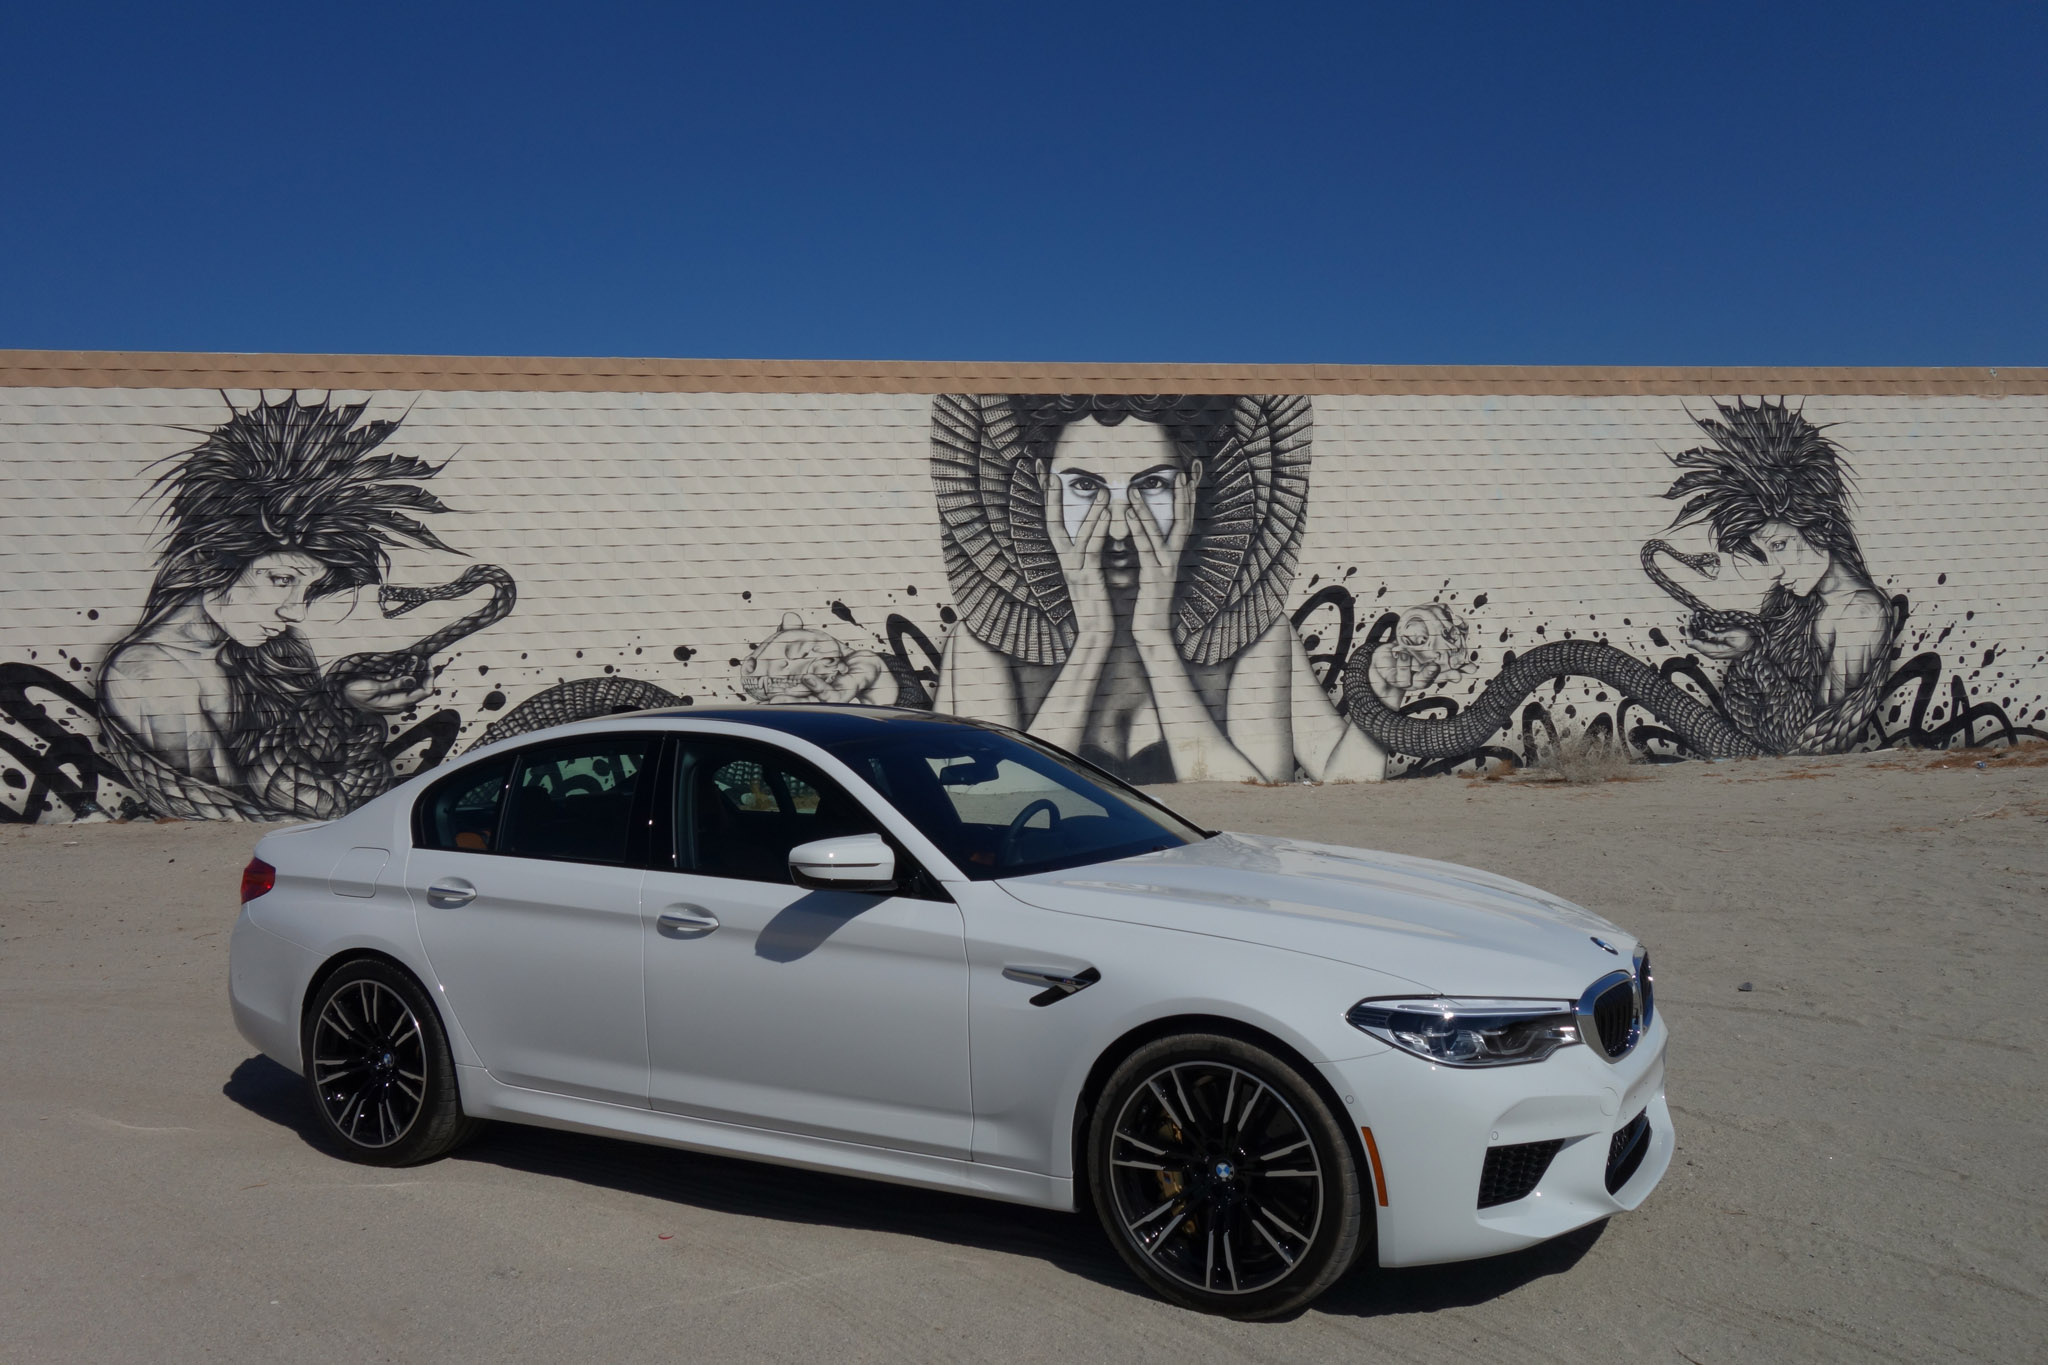 2018 BMW Group Test Fest M5 Sedan Mural By Karma